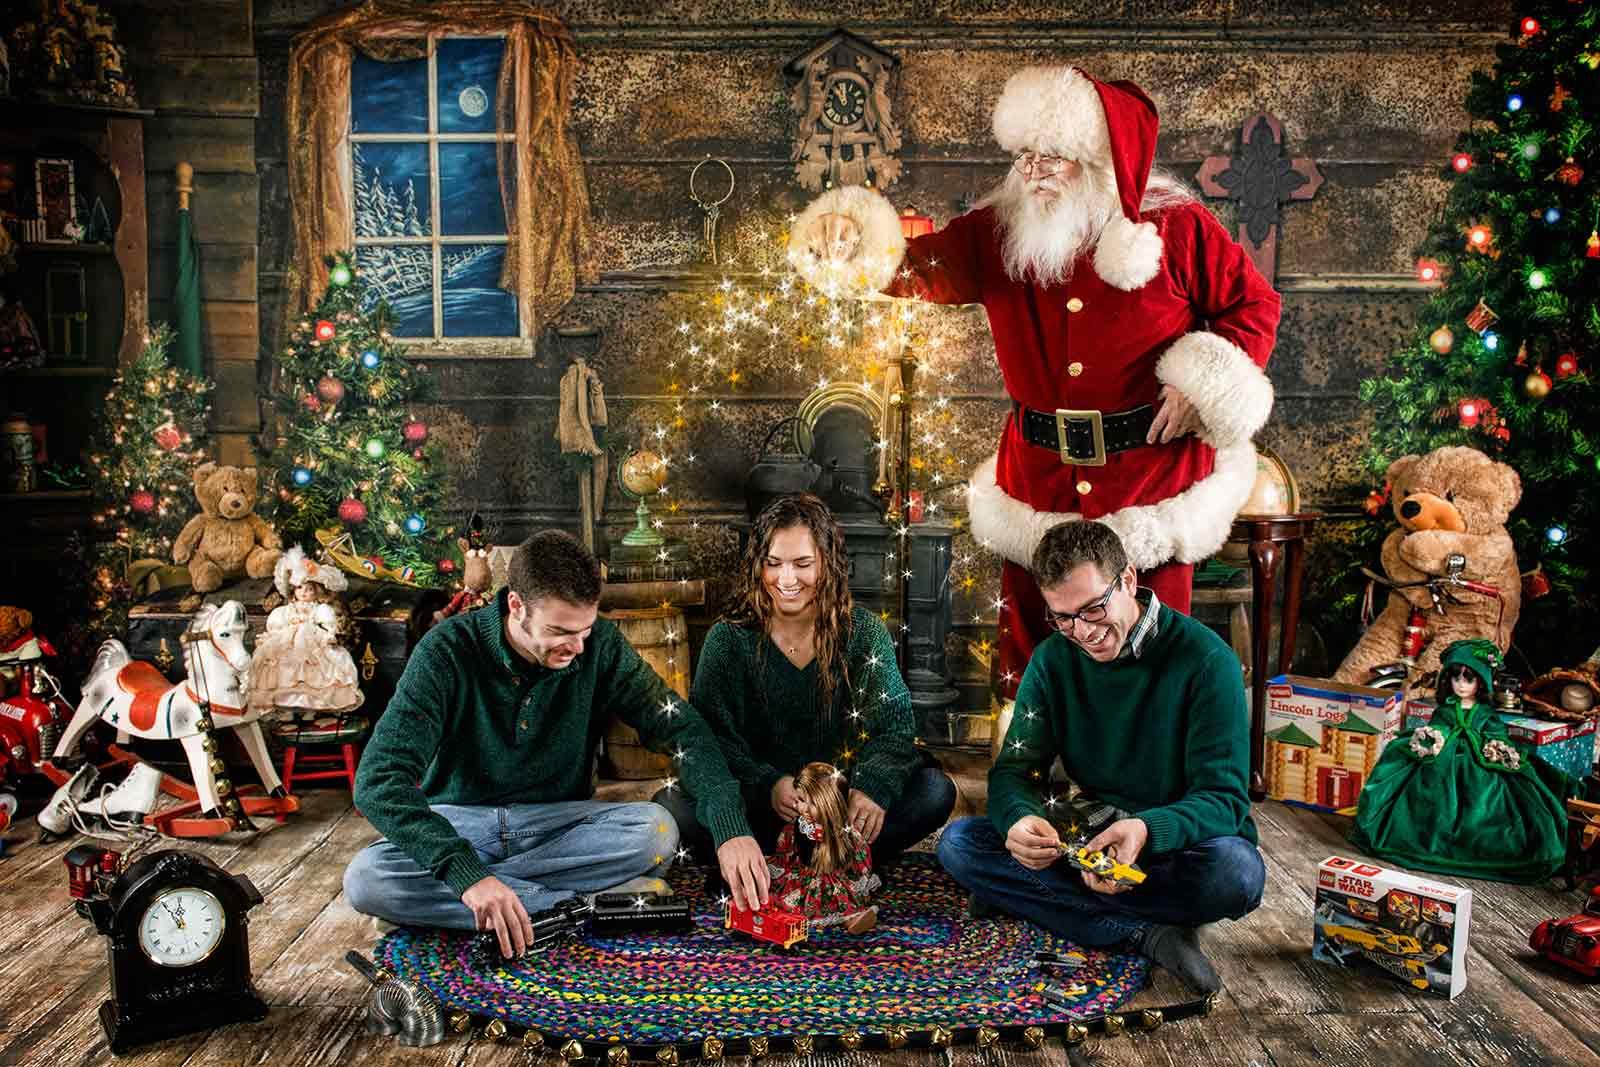 024_Magic-of-Santa-Anna-Thielen-Photography